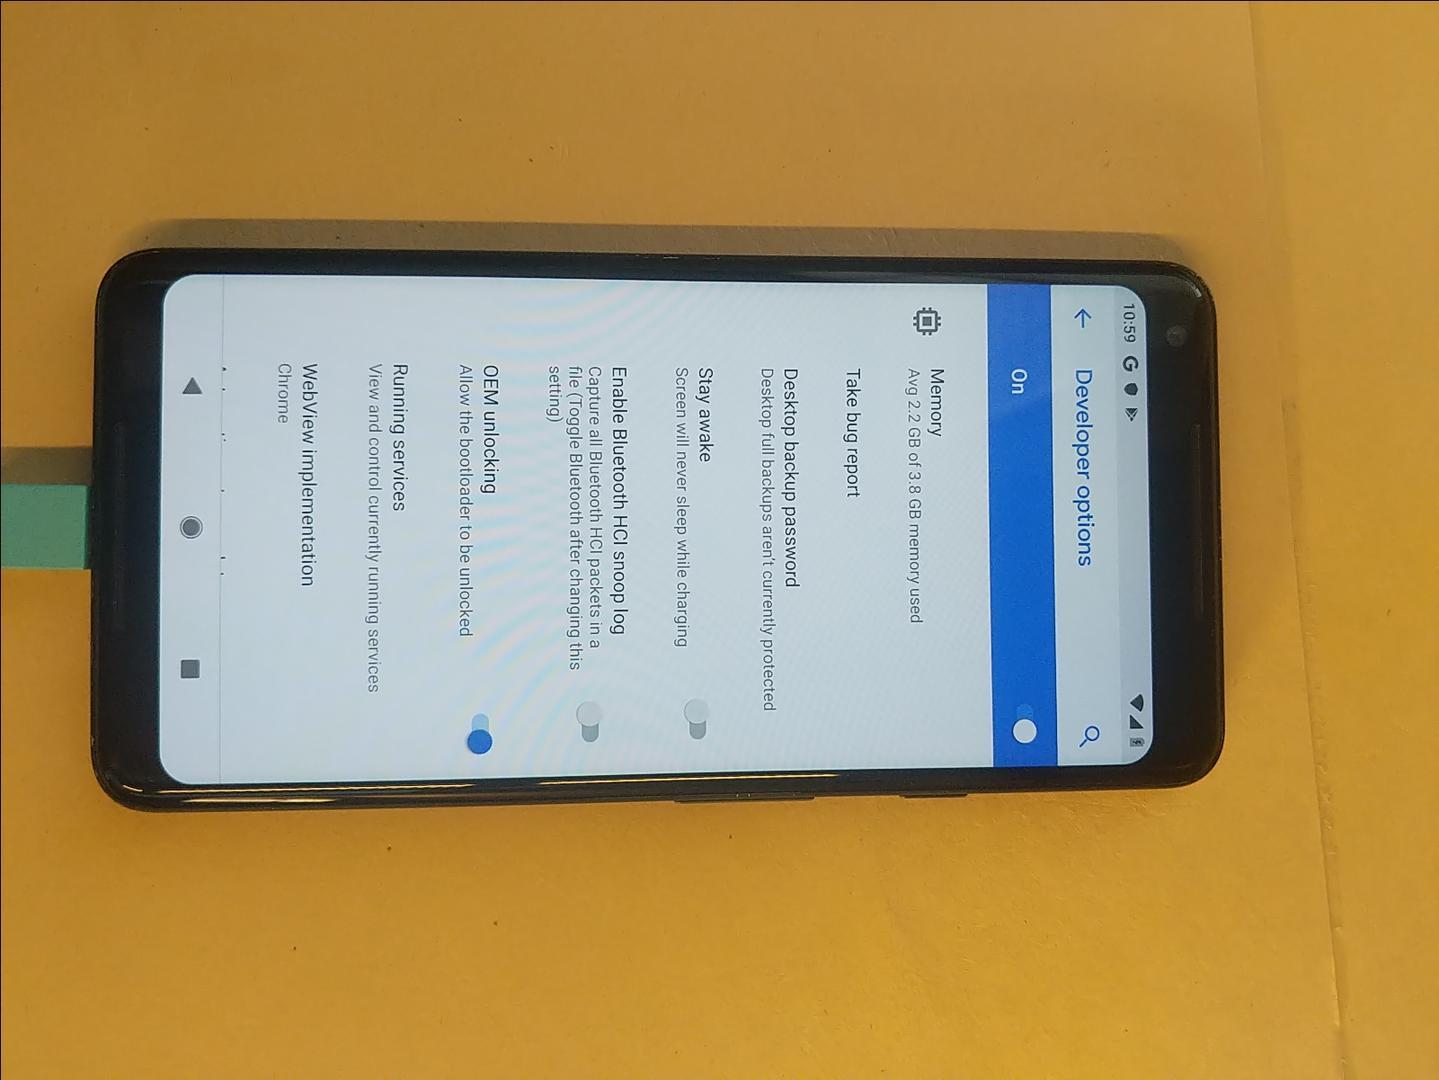 Google Pixel 2 XL (Unlocked), Google Edition - Black, 128 GB